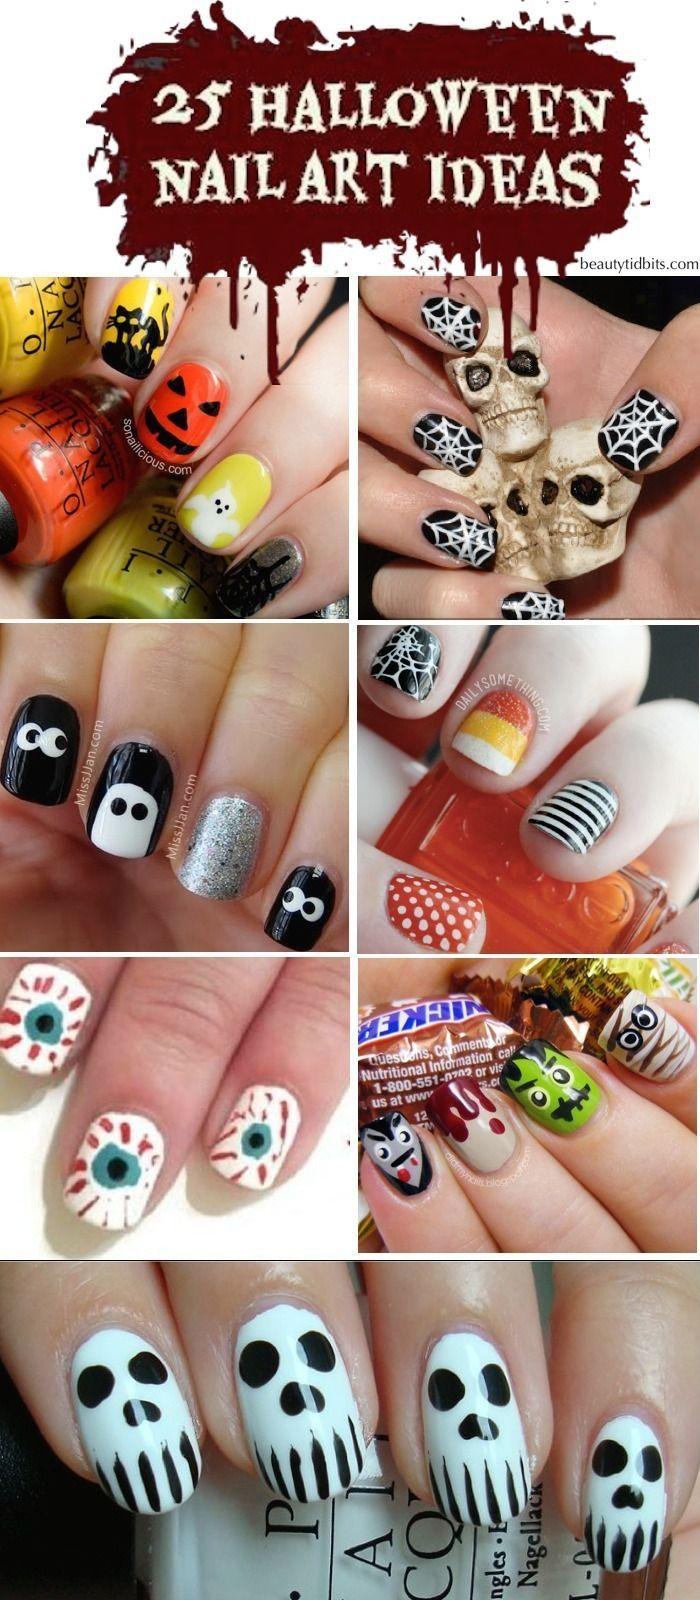 25 Spooky Simple Halloween Nail Art Ideas Pinterest Fun Nails